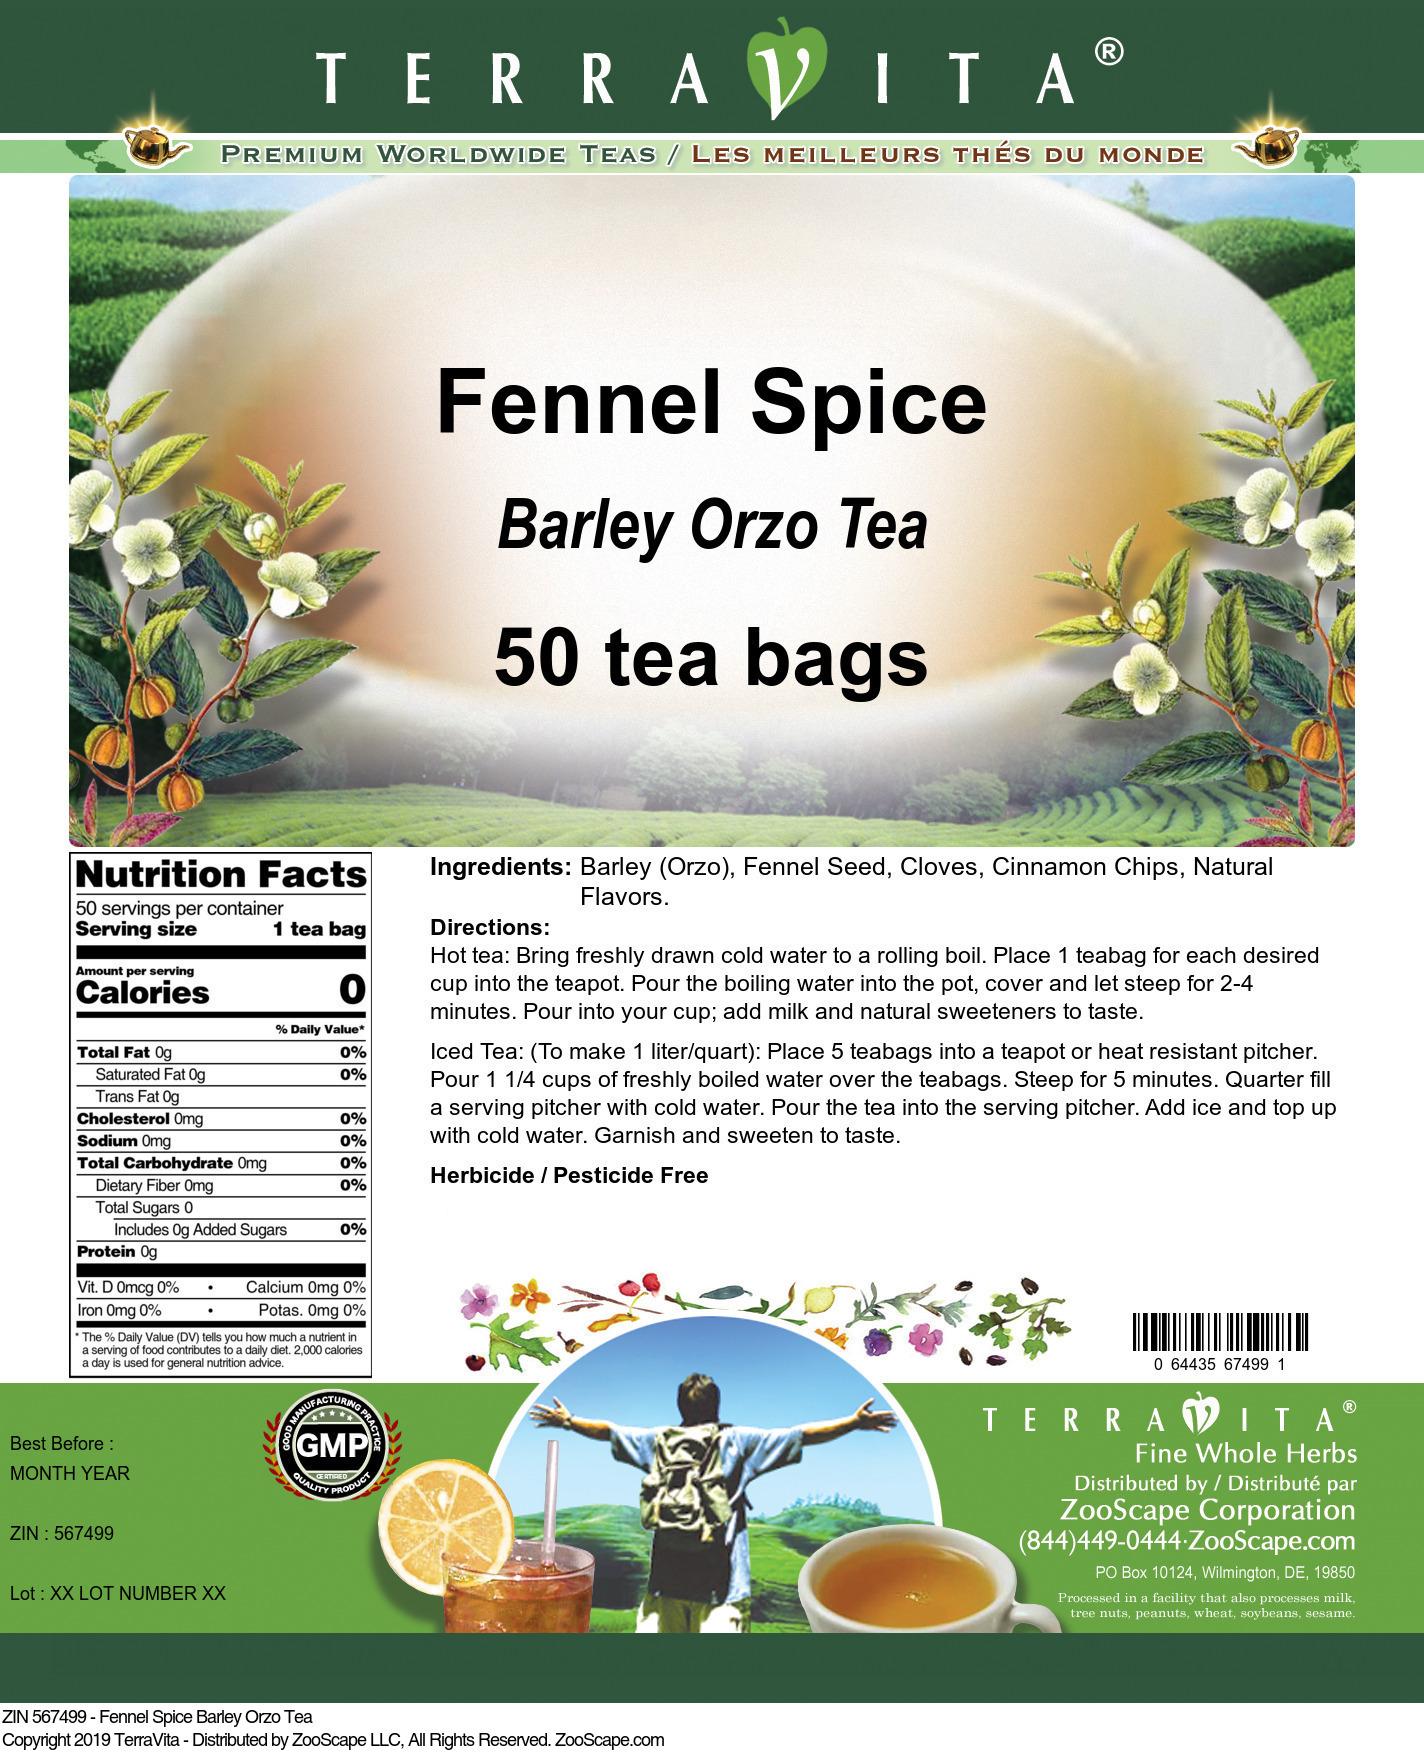 Fennel Spice Barley Orzo